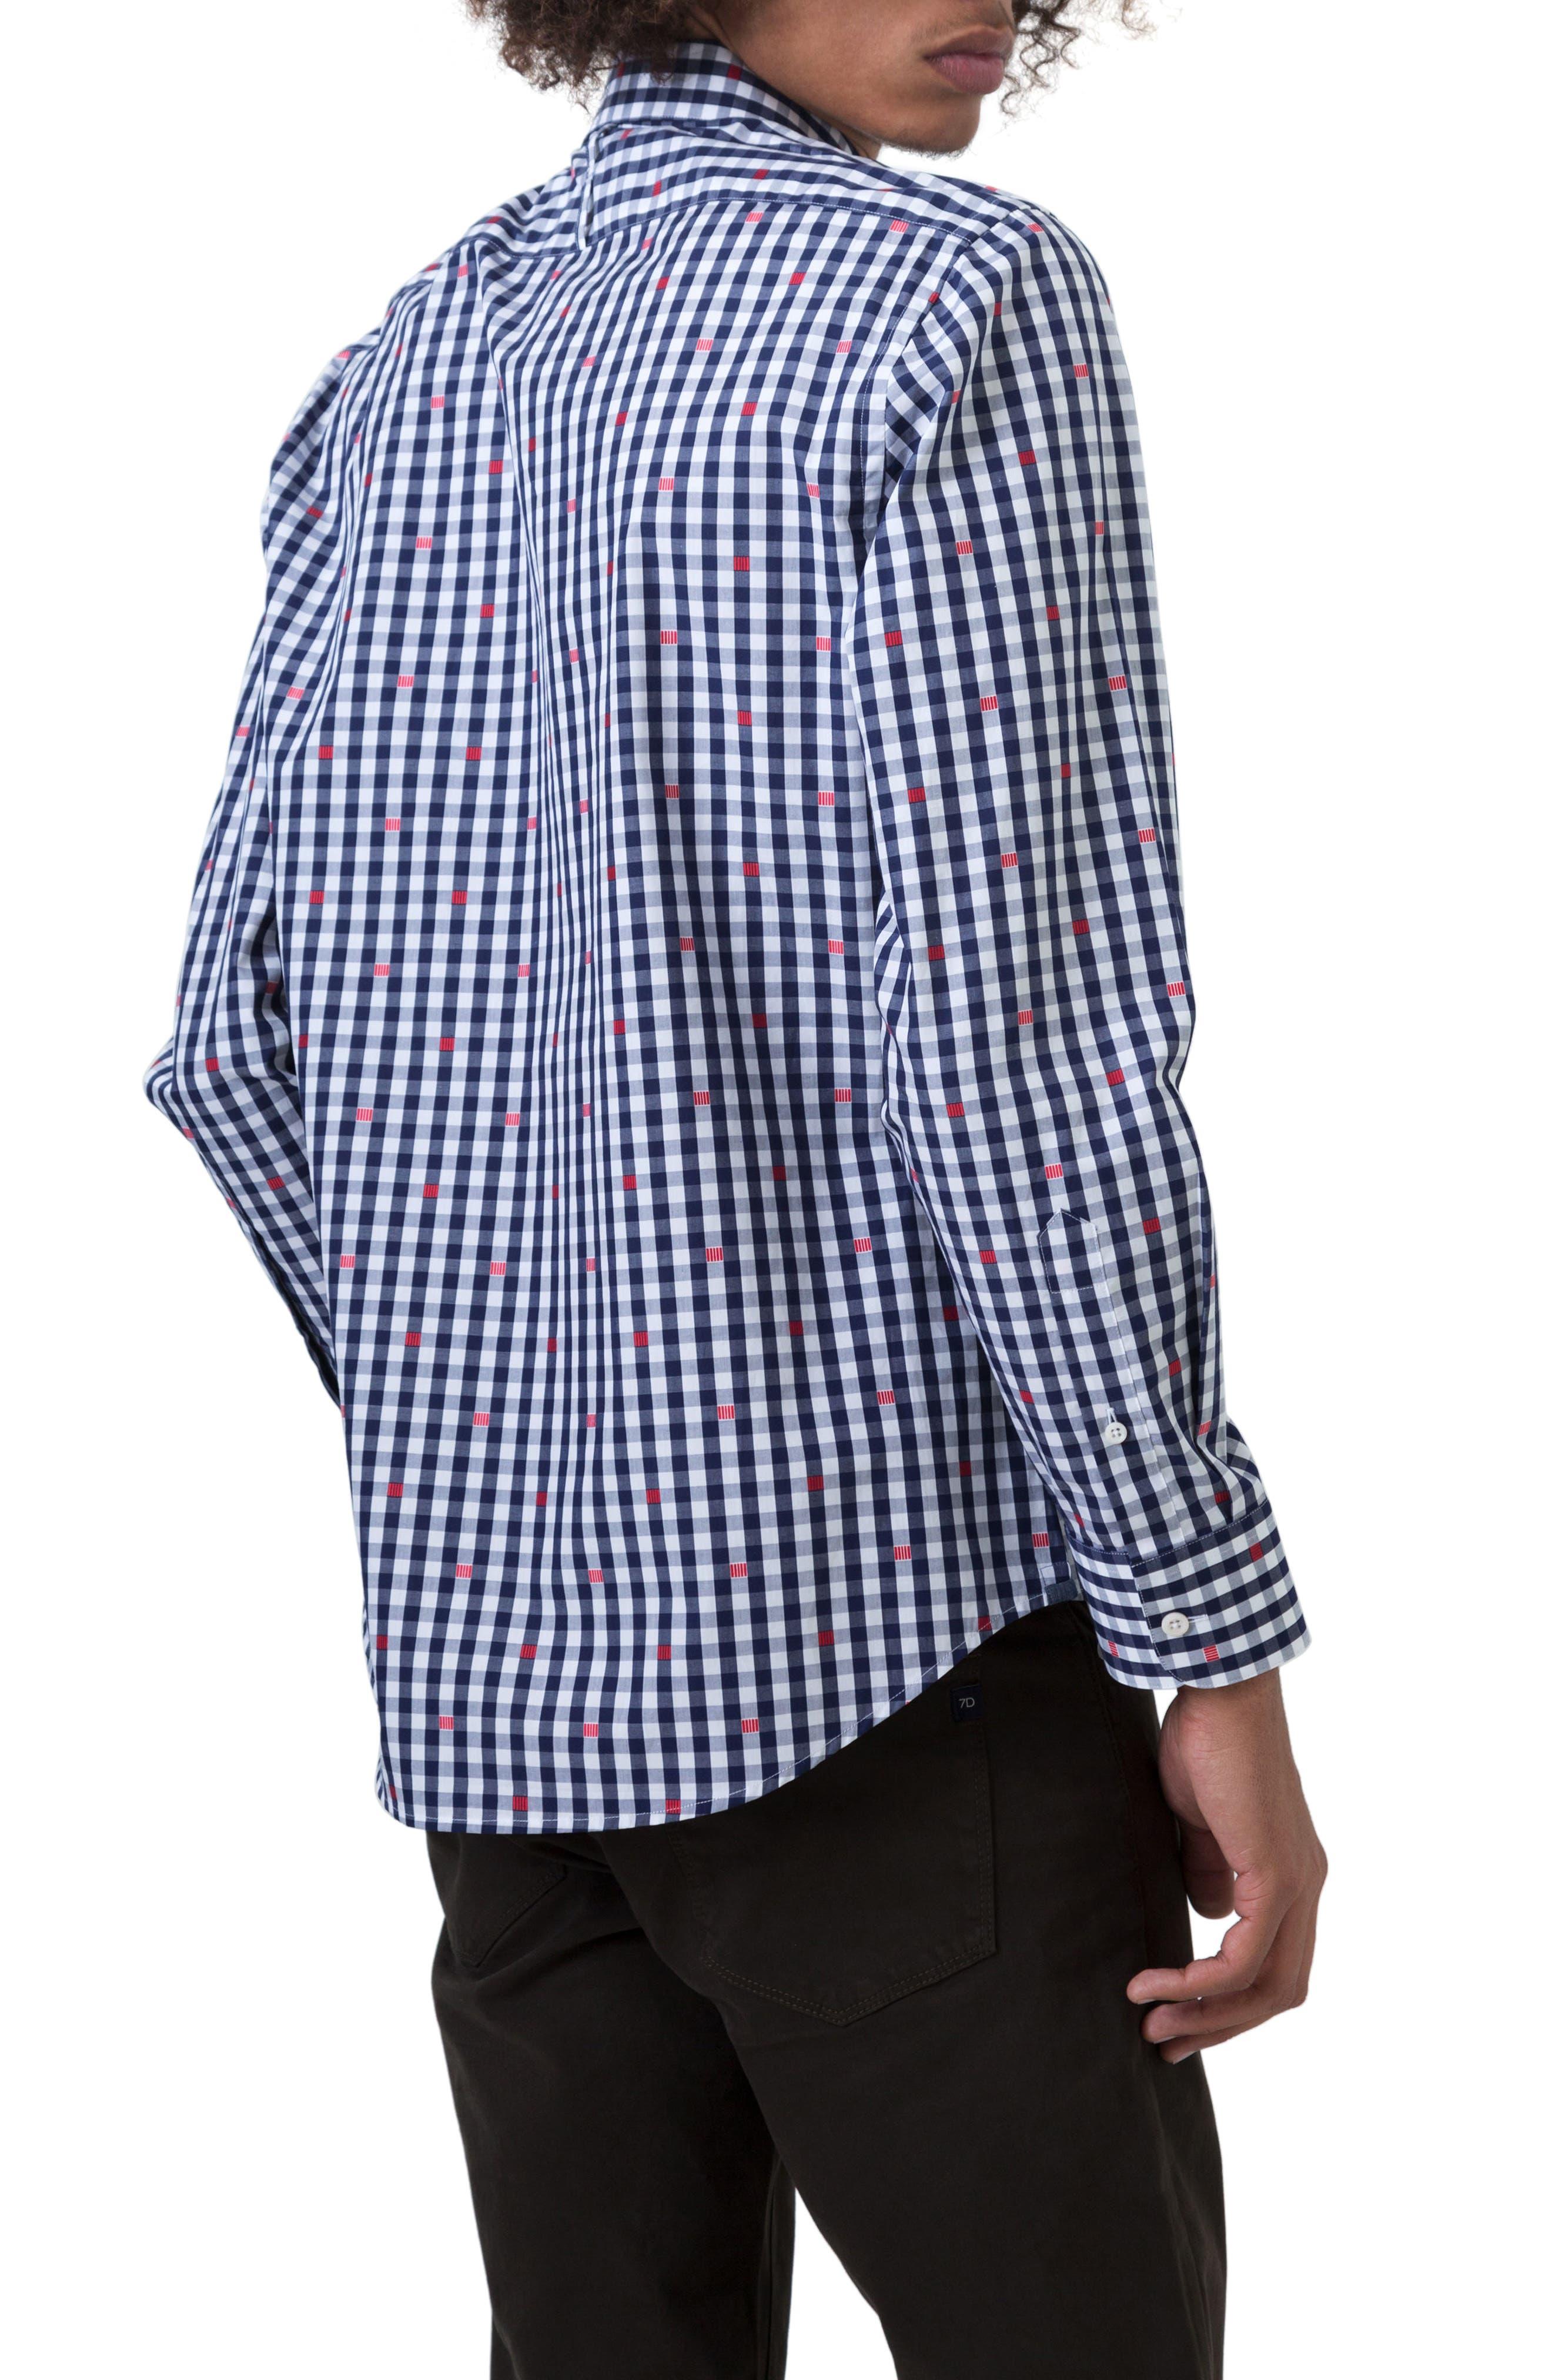 Petrichor Woven Shirt,                             Alternate thumbnail 2, color,                             410